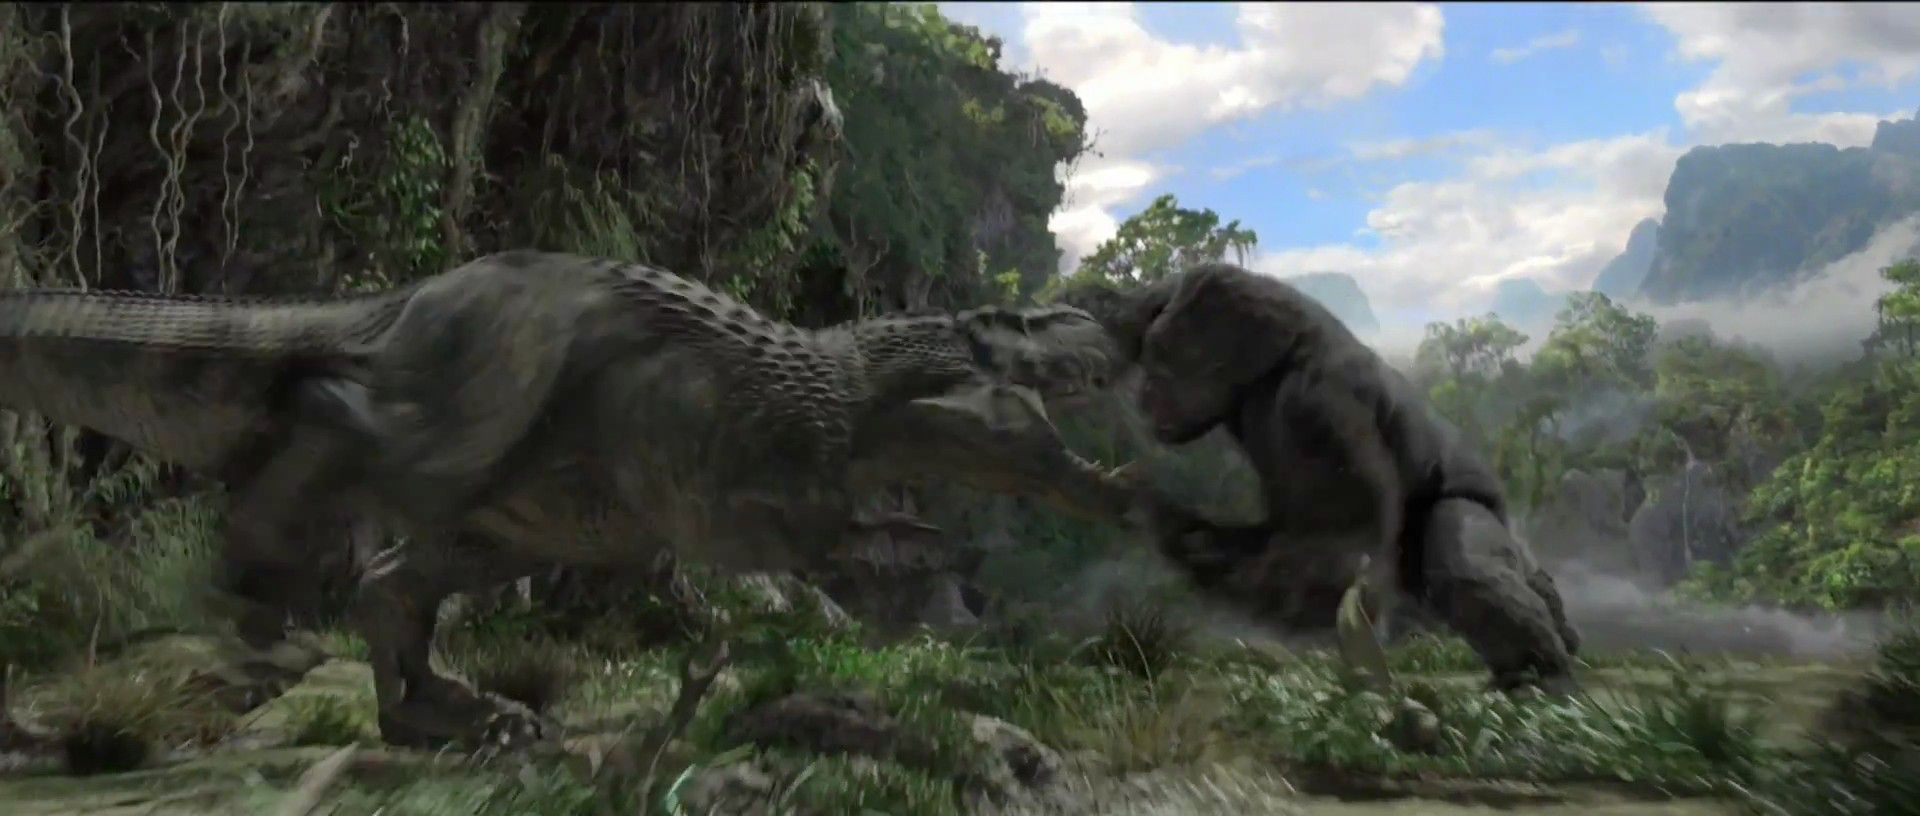 t-rex-versus-king-kong.jpg